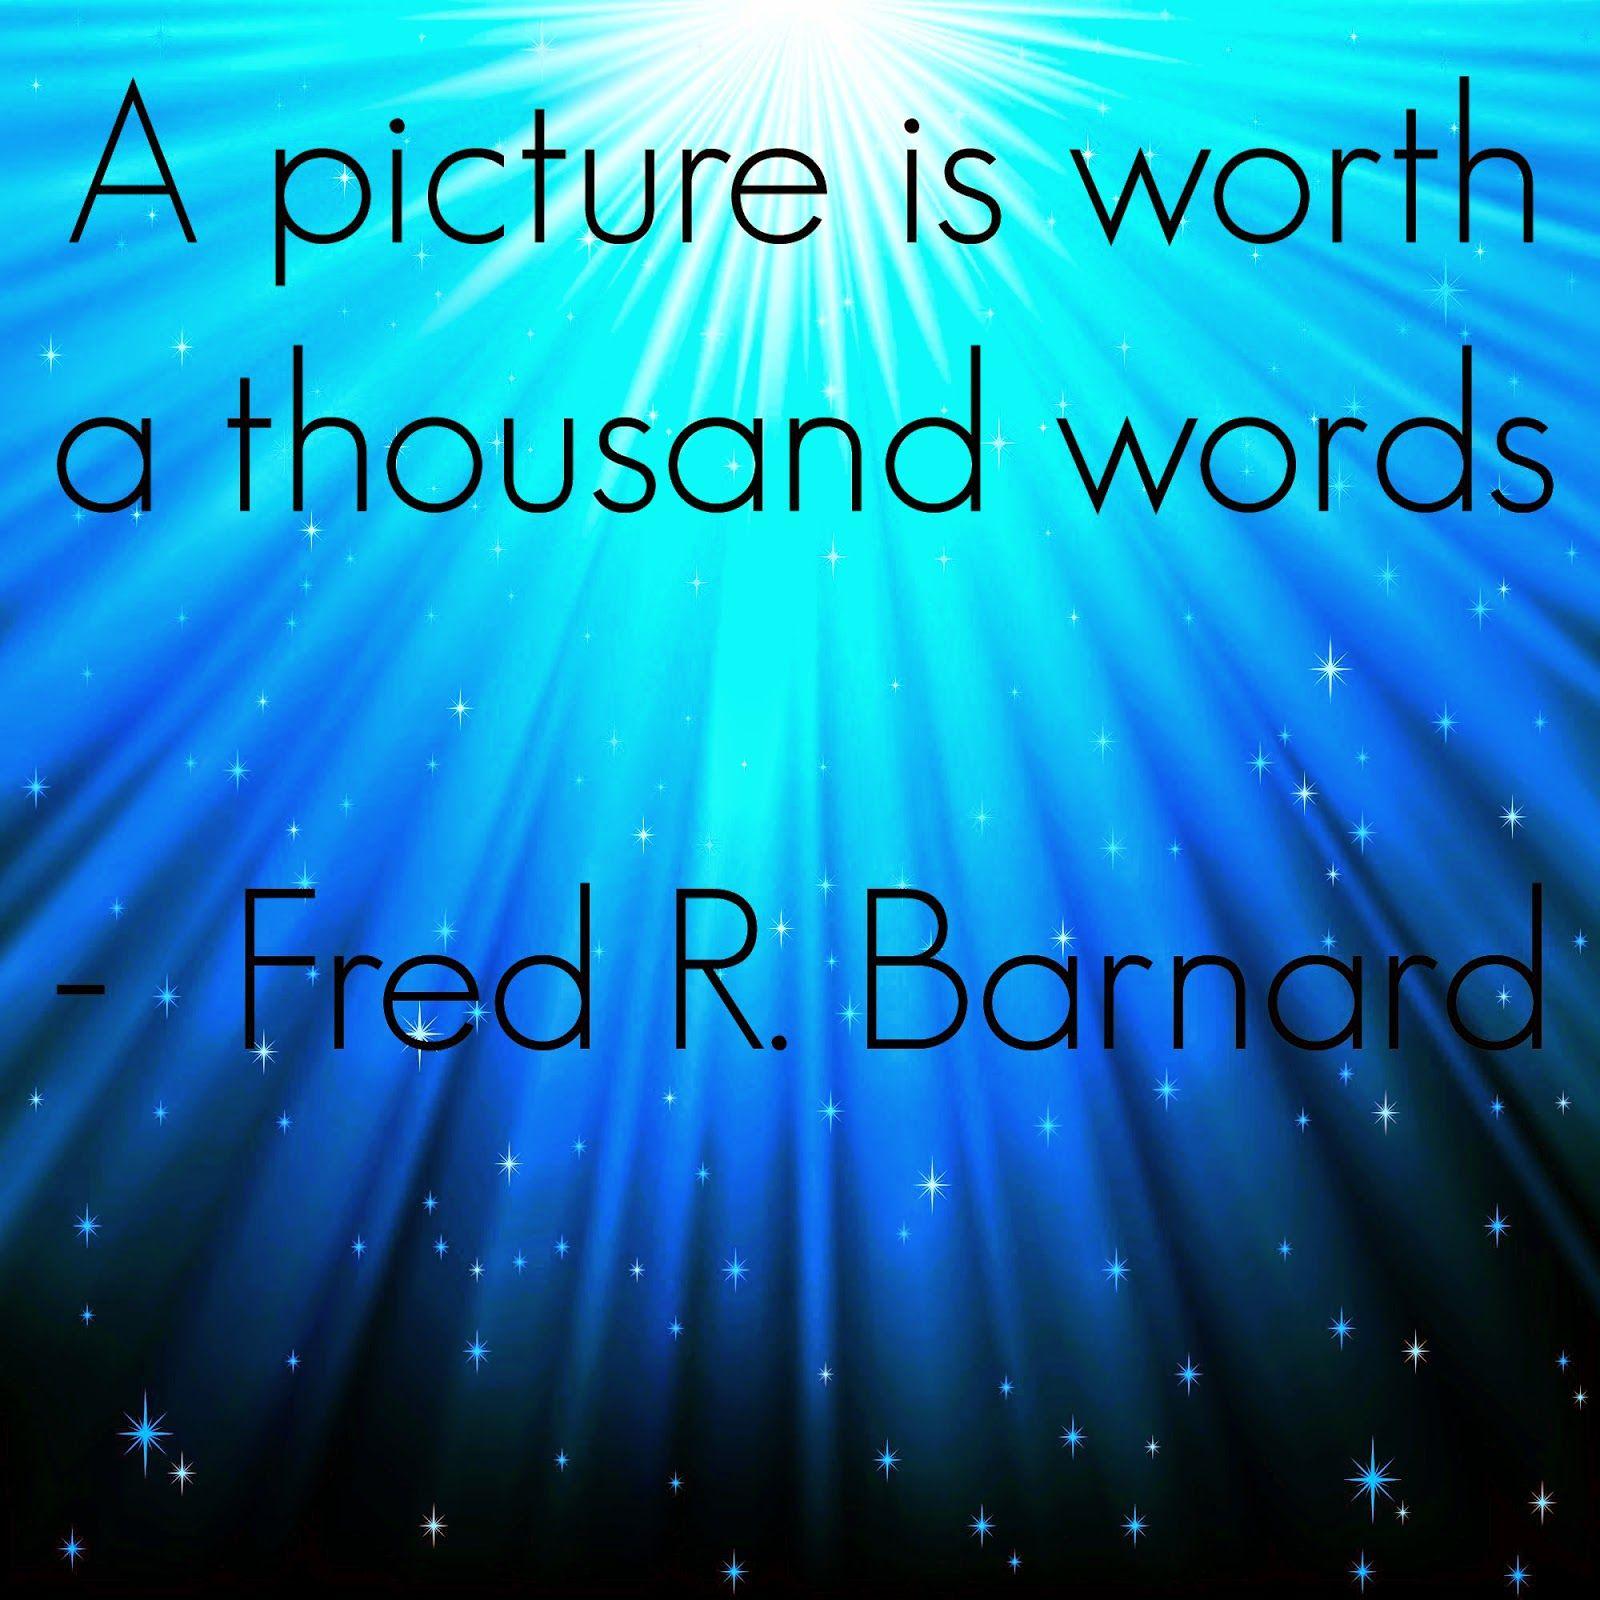 Top 5 online sites for free photographs & images for websites & blogs http://bit.ly/1onV6dX